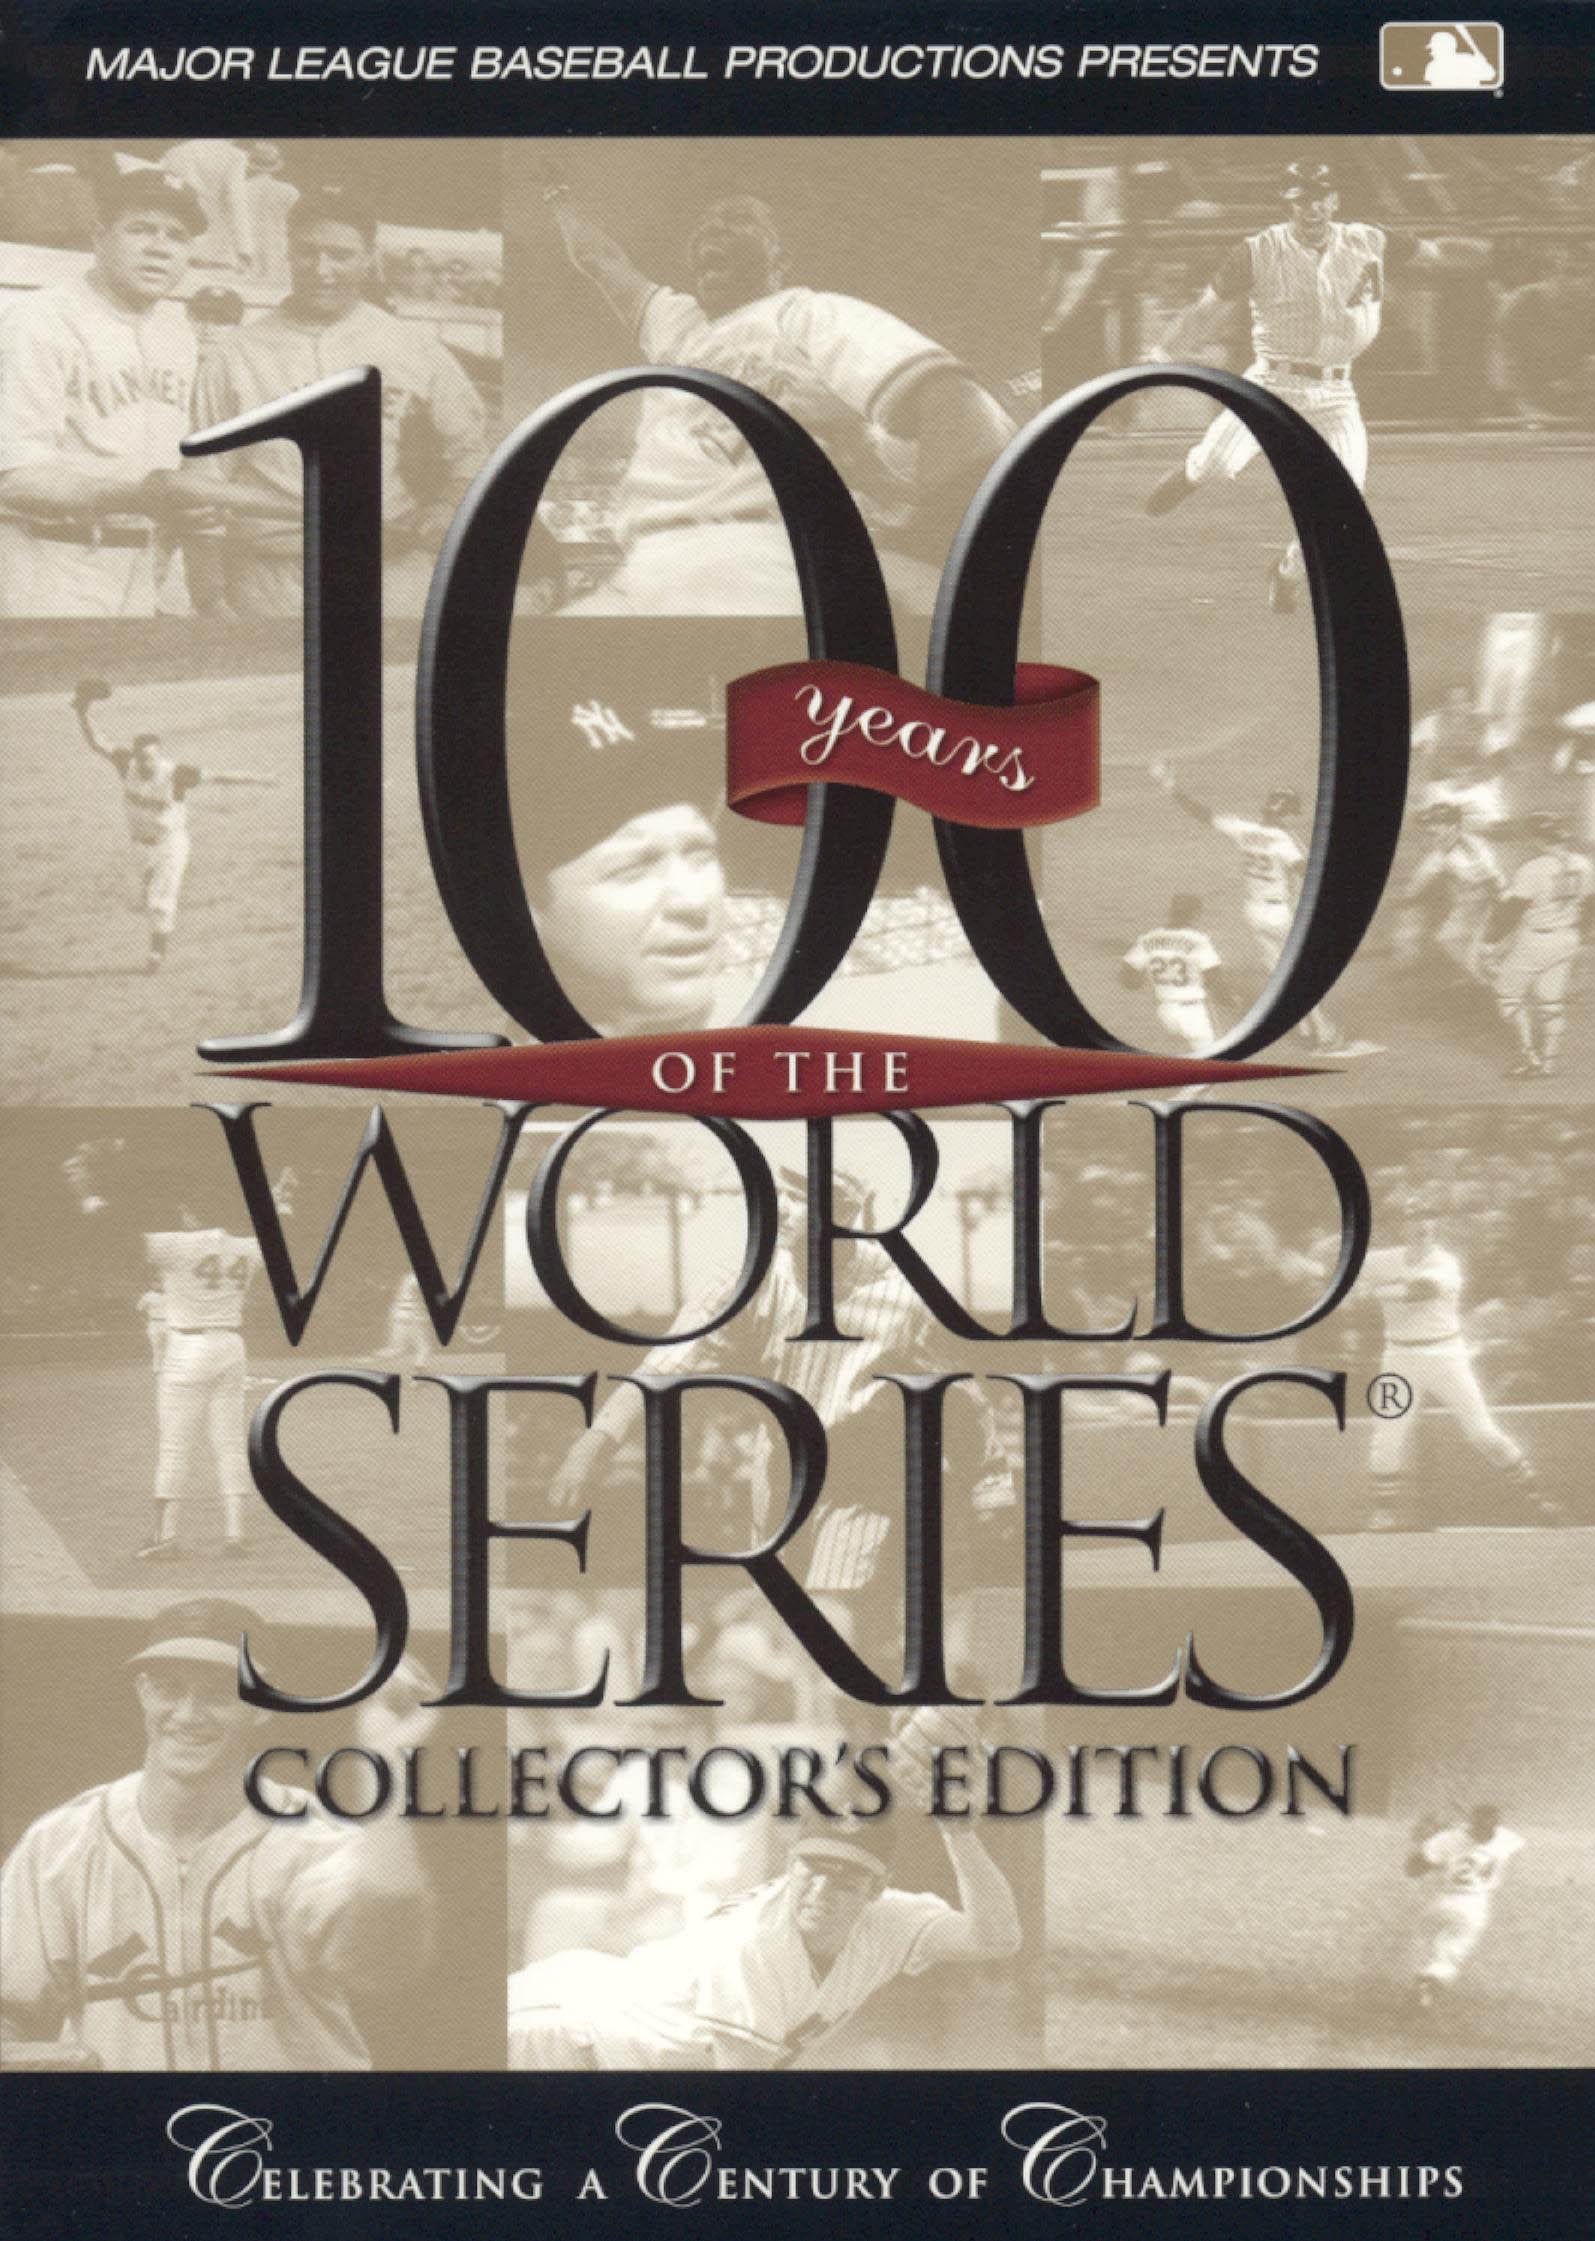 MLB: 100 Years of the World Series